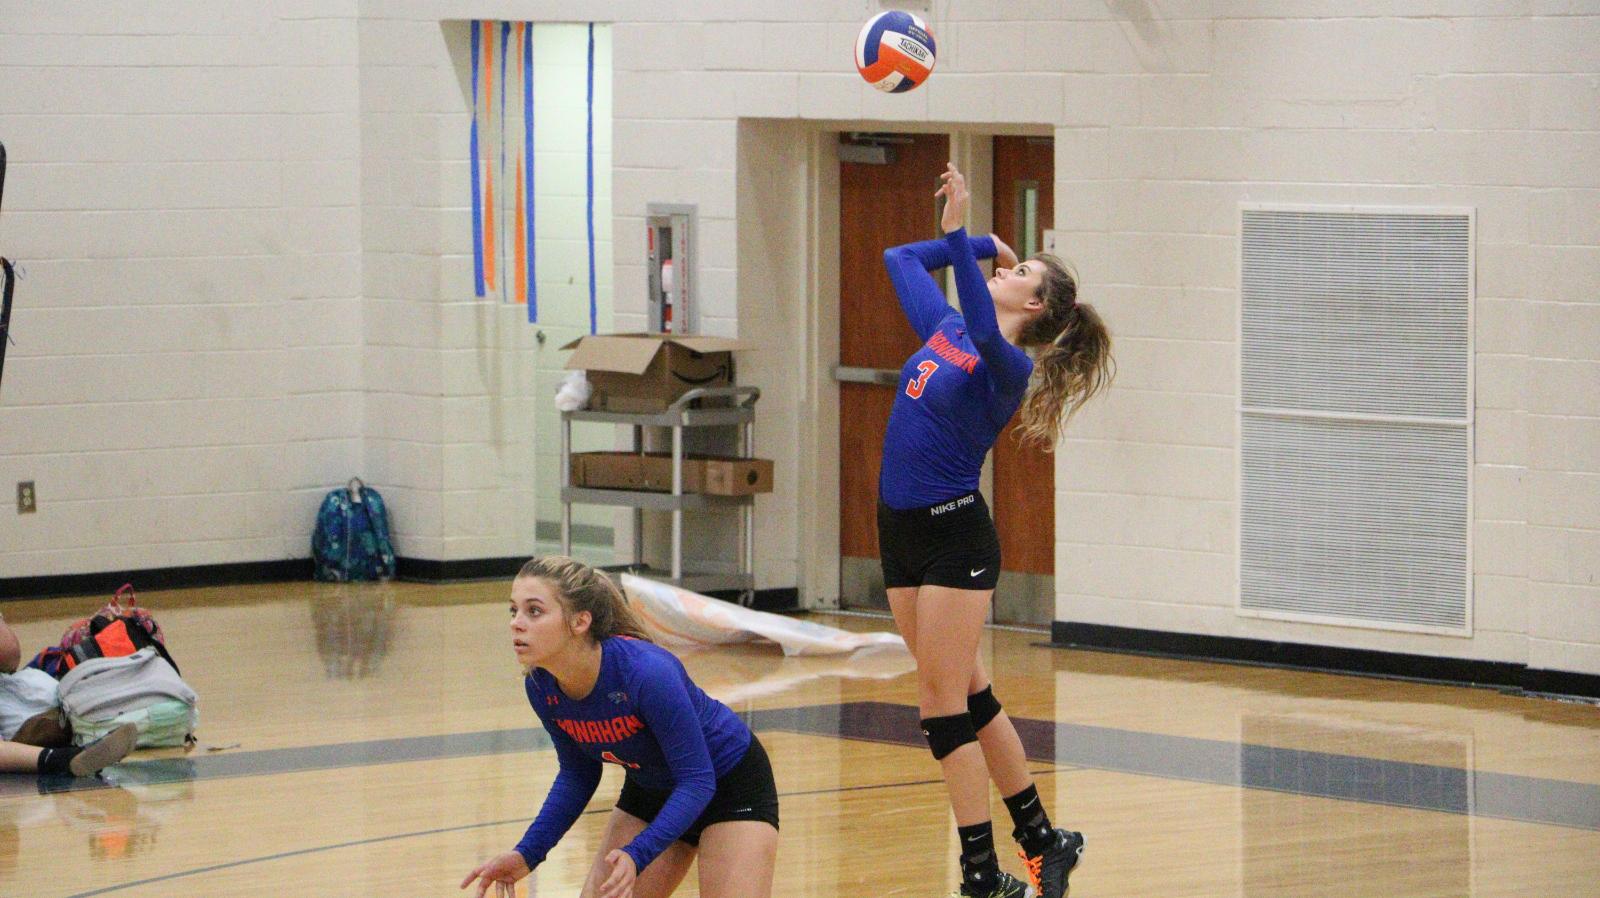 Volleyball Tie-Breaker Match on Monday